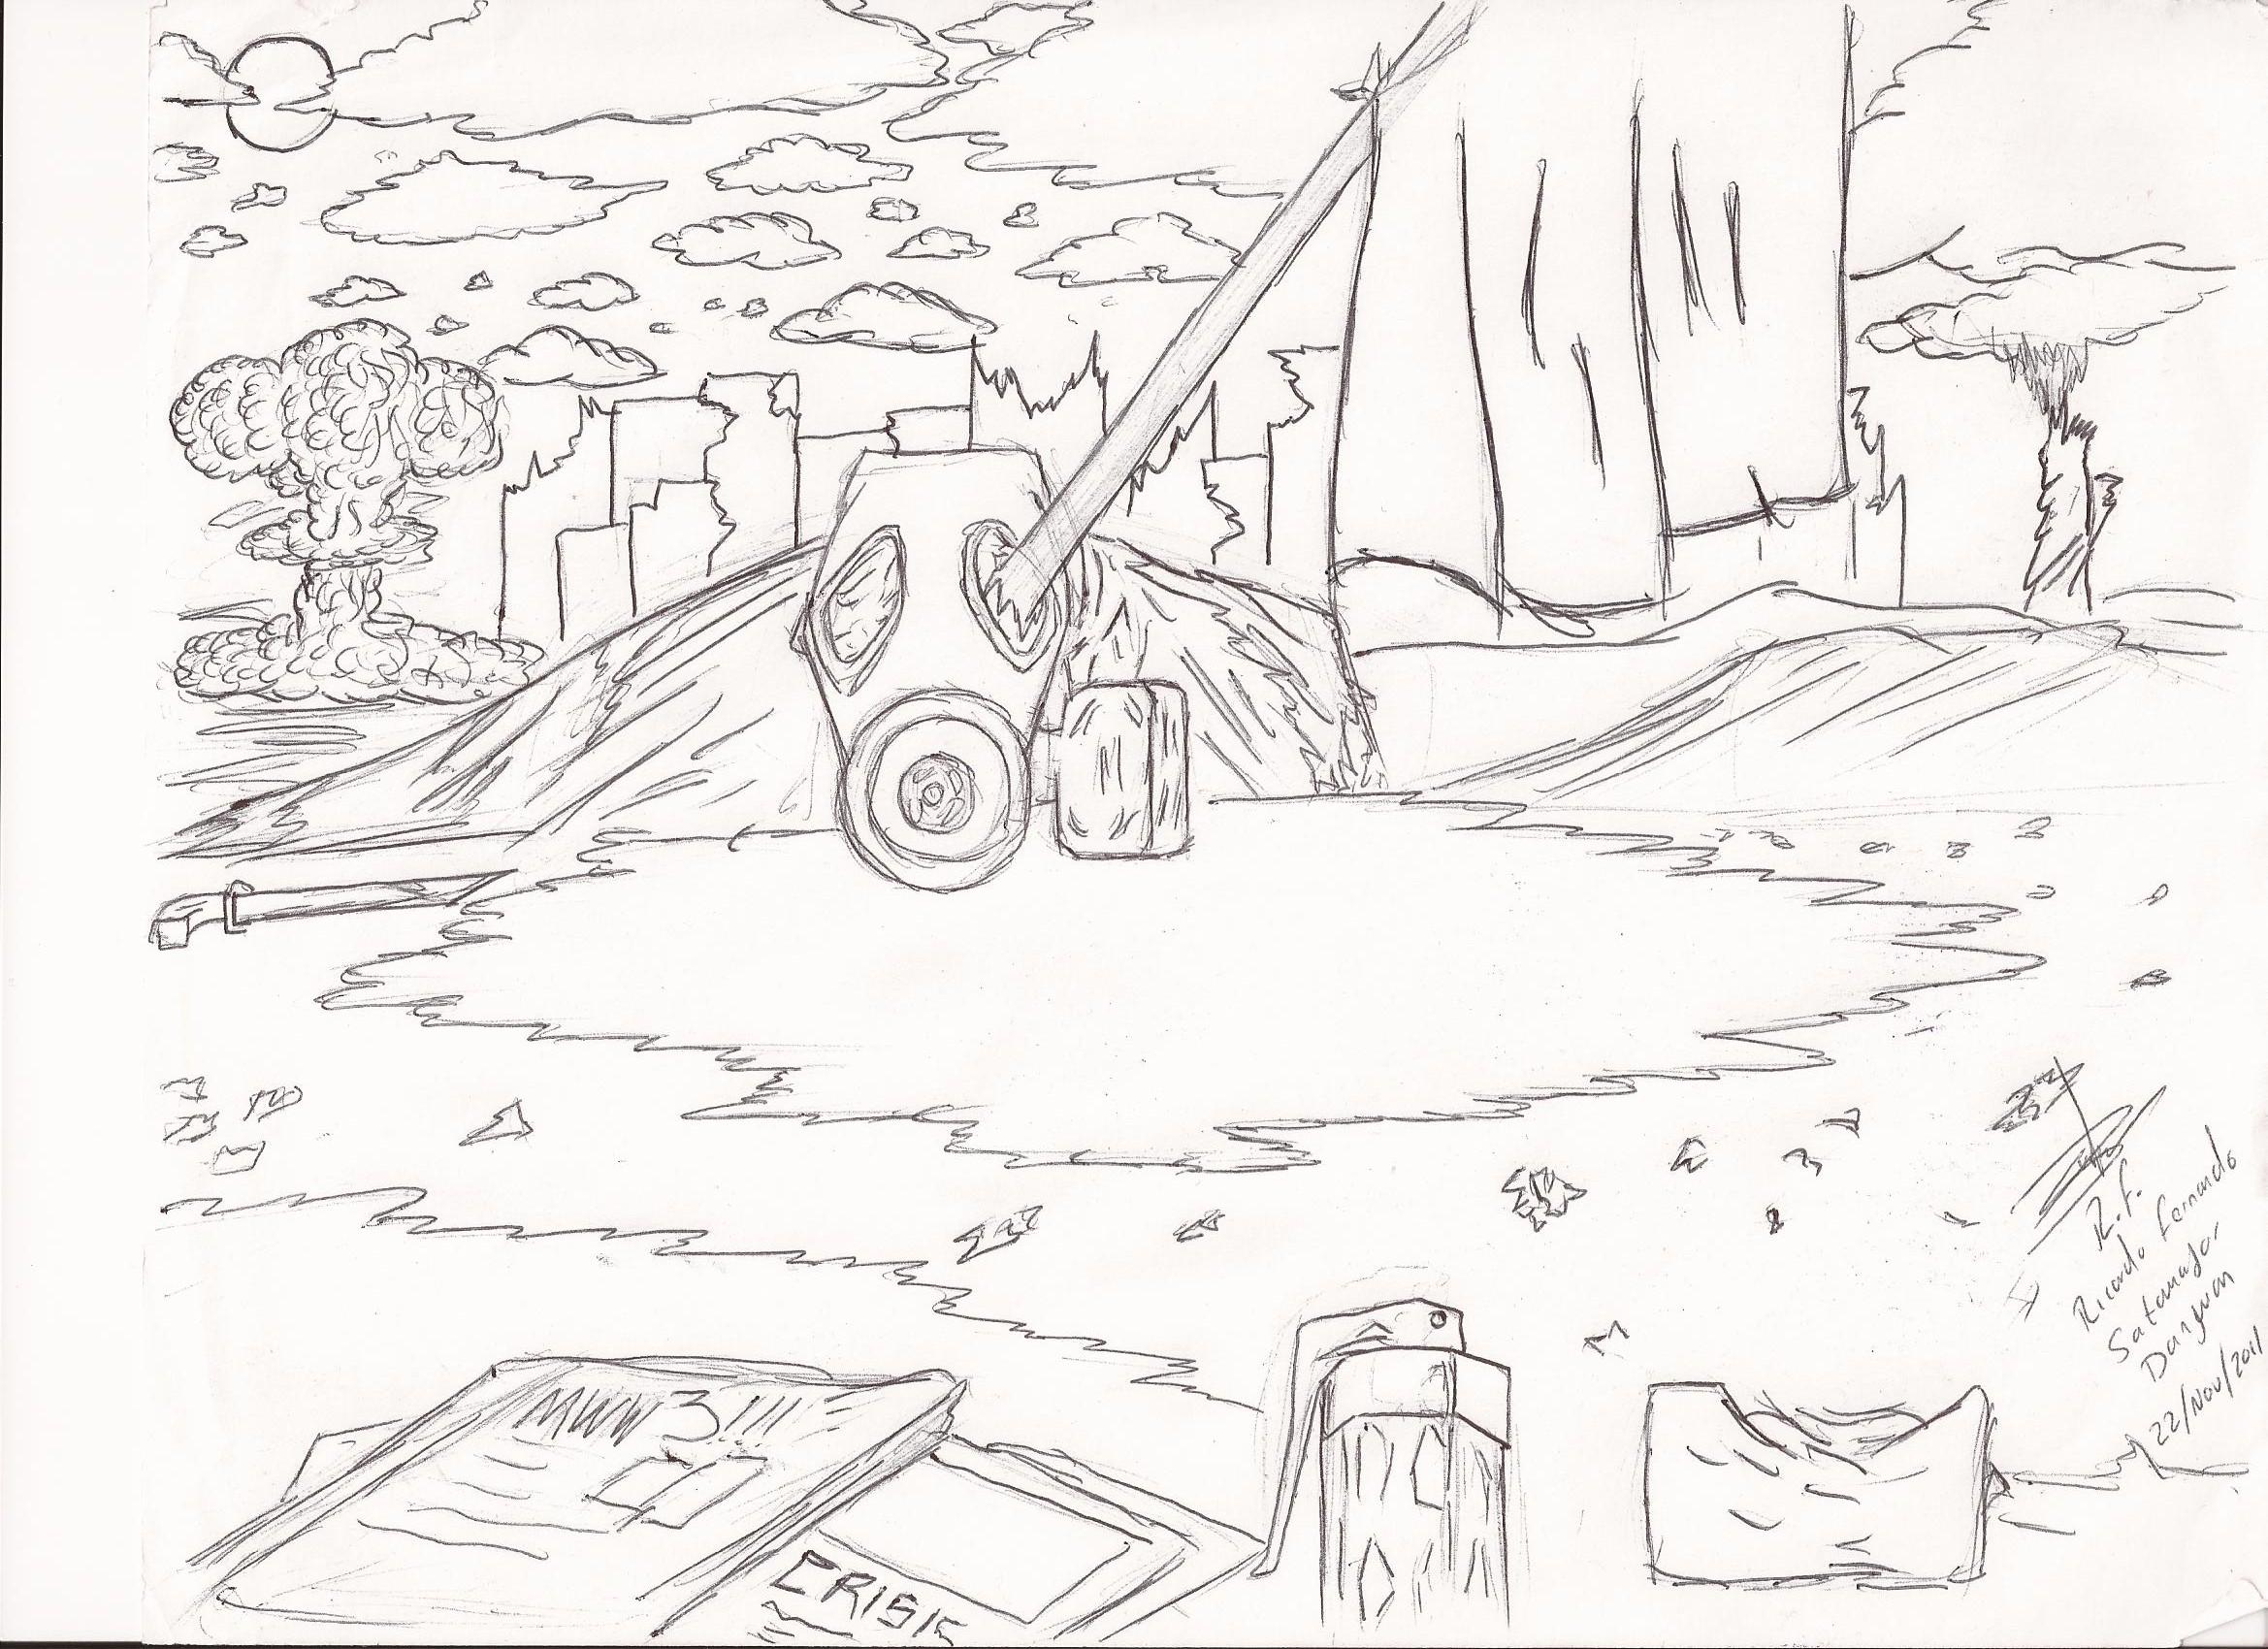 Wallpaper of My Videogame. N/C